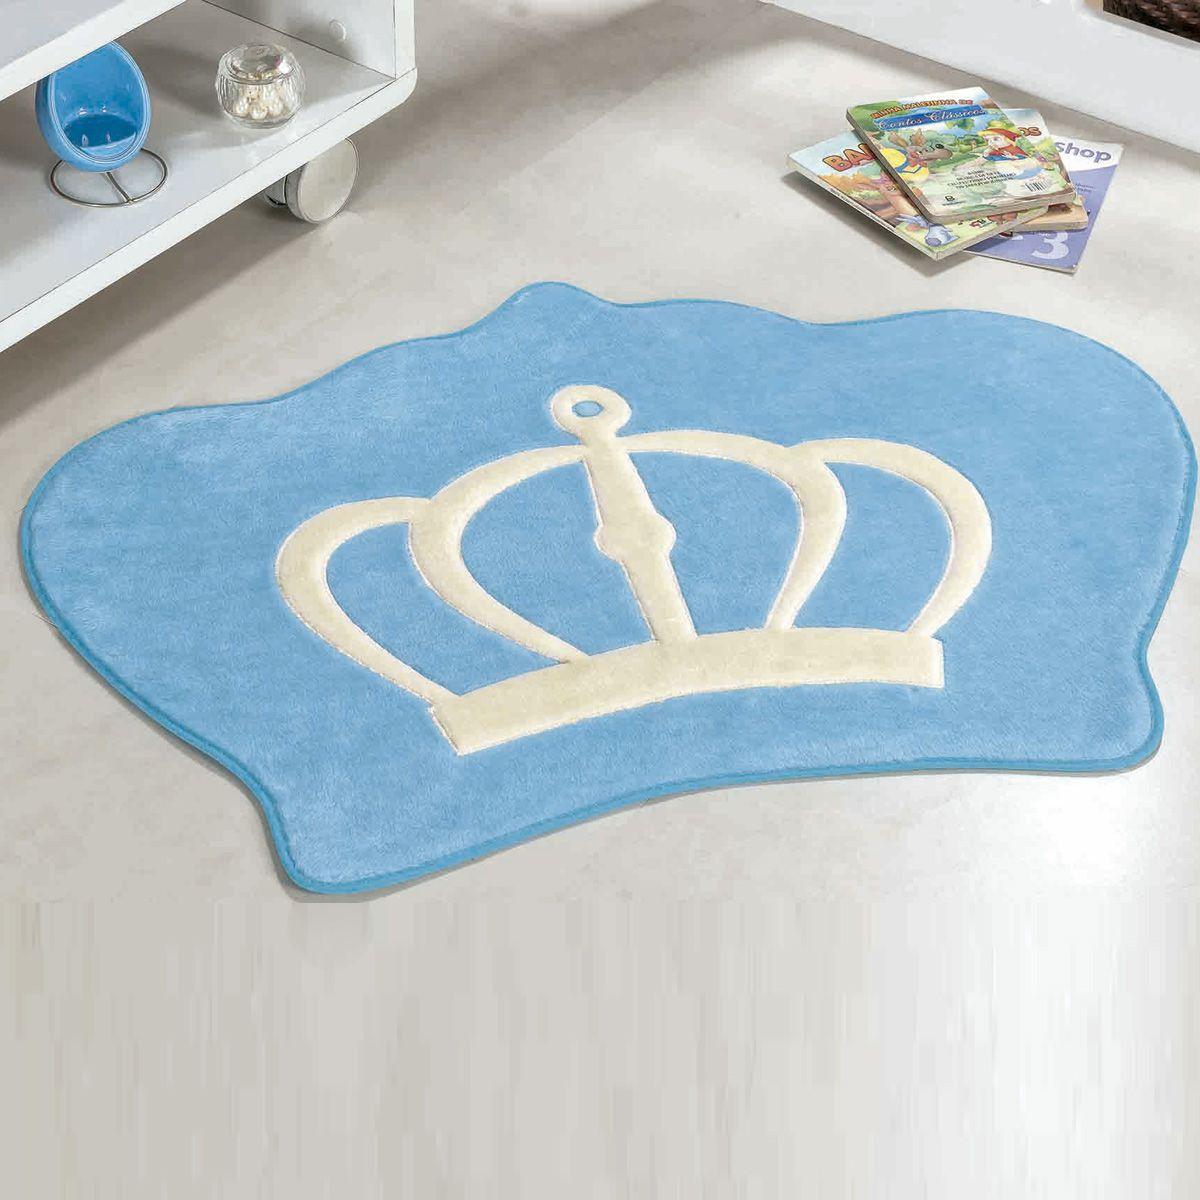 Tapete Infantil Premium Formato Coroa Azul Turquesa 86cm x 64cm